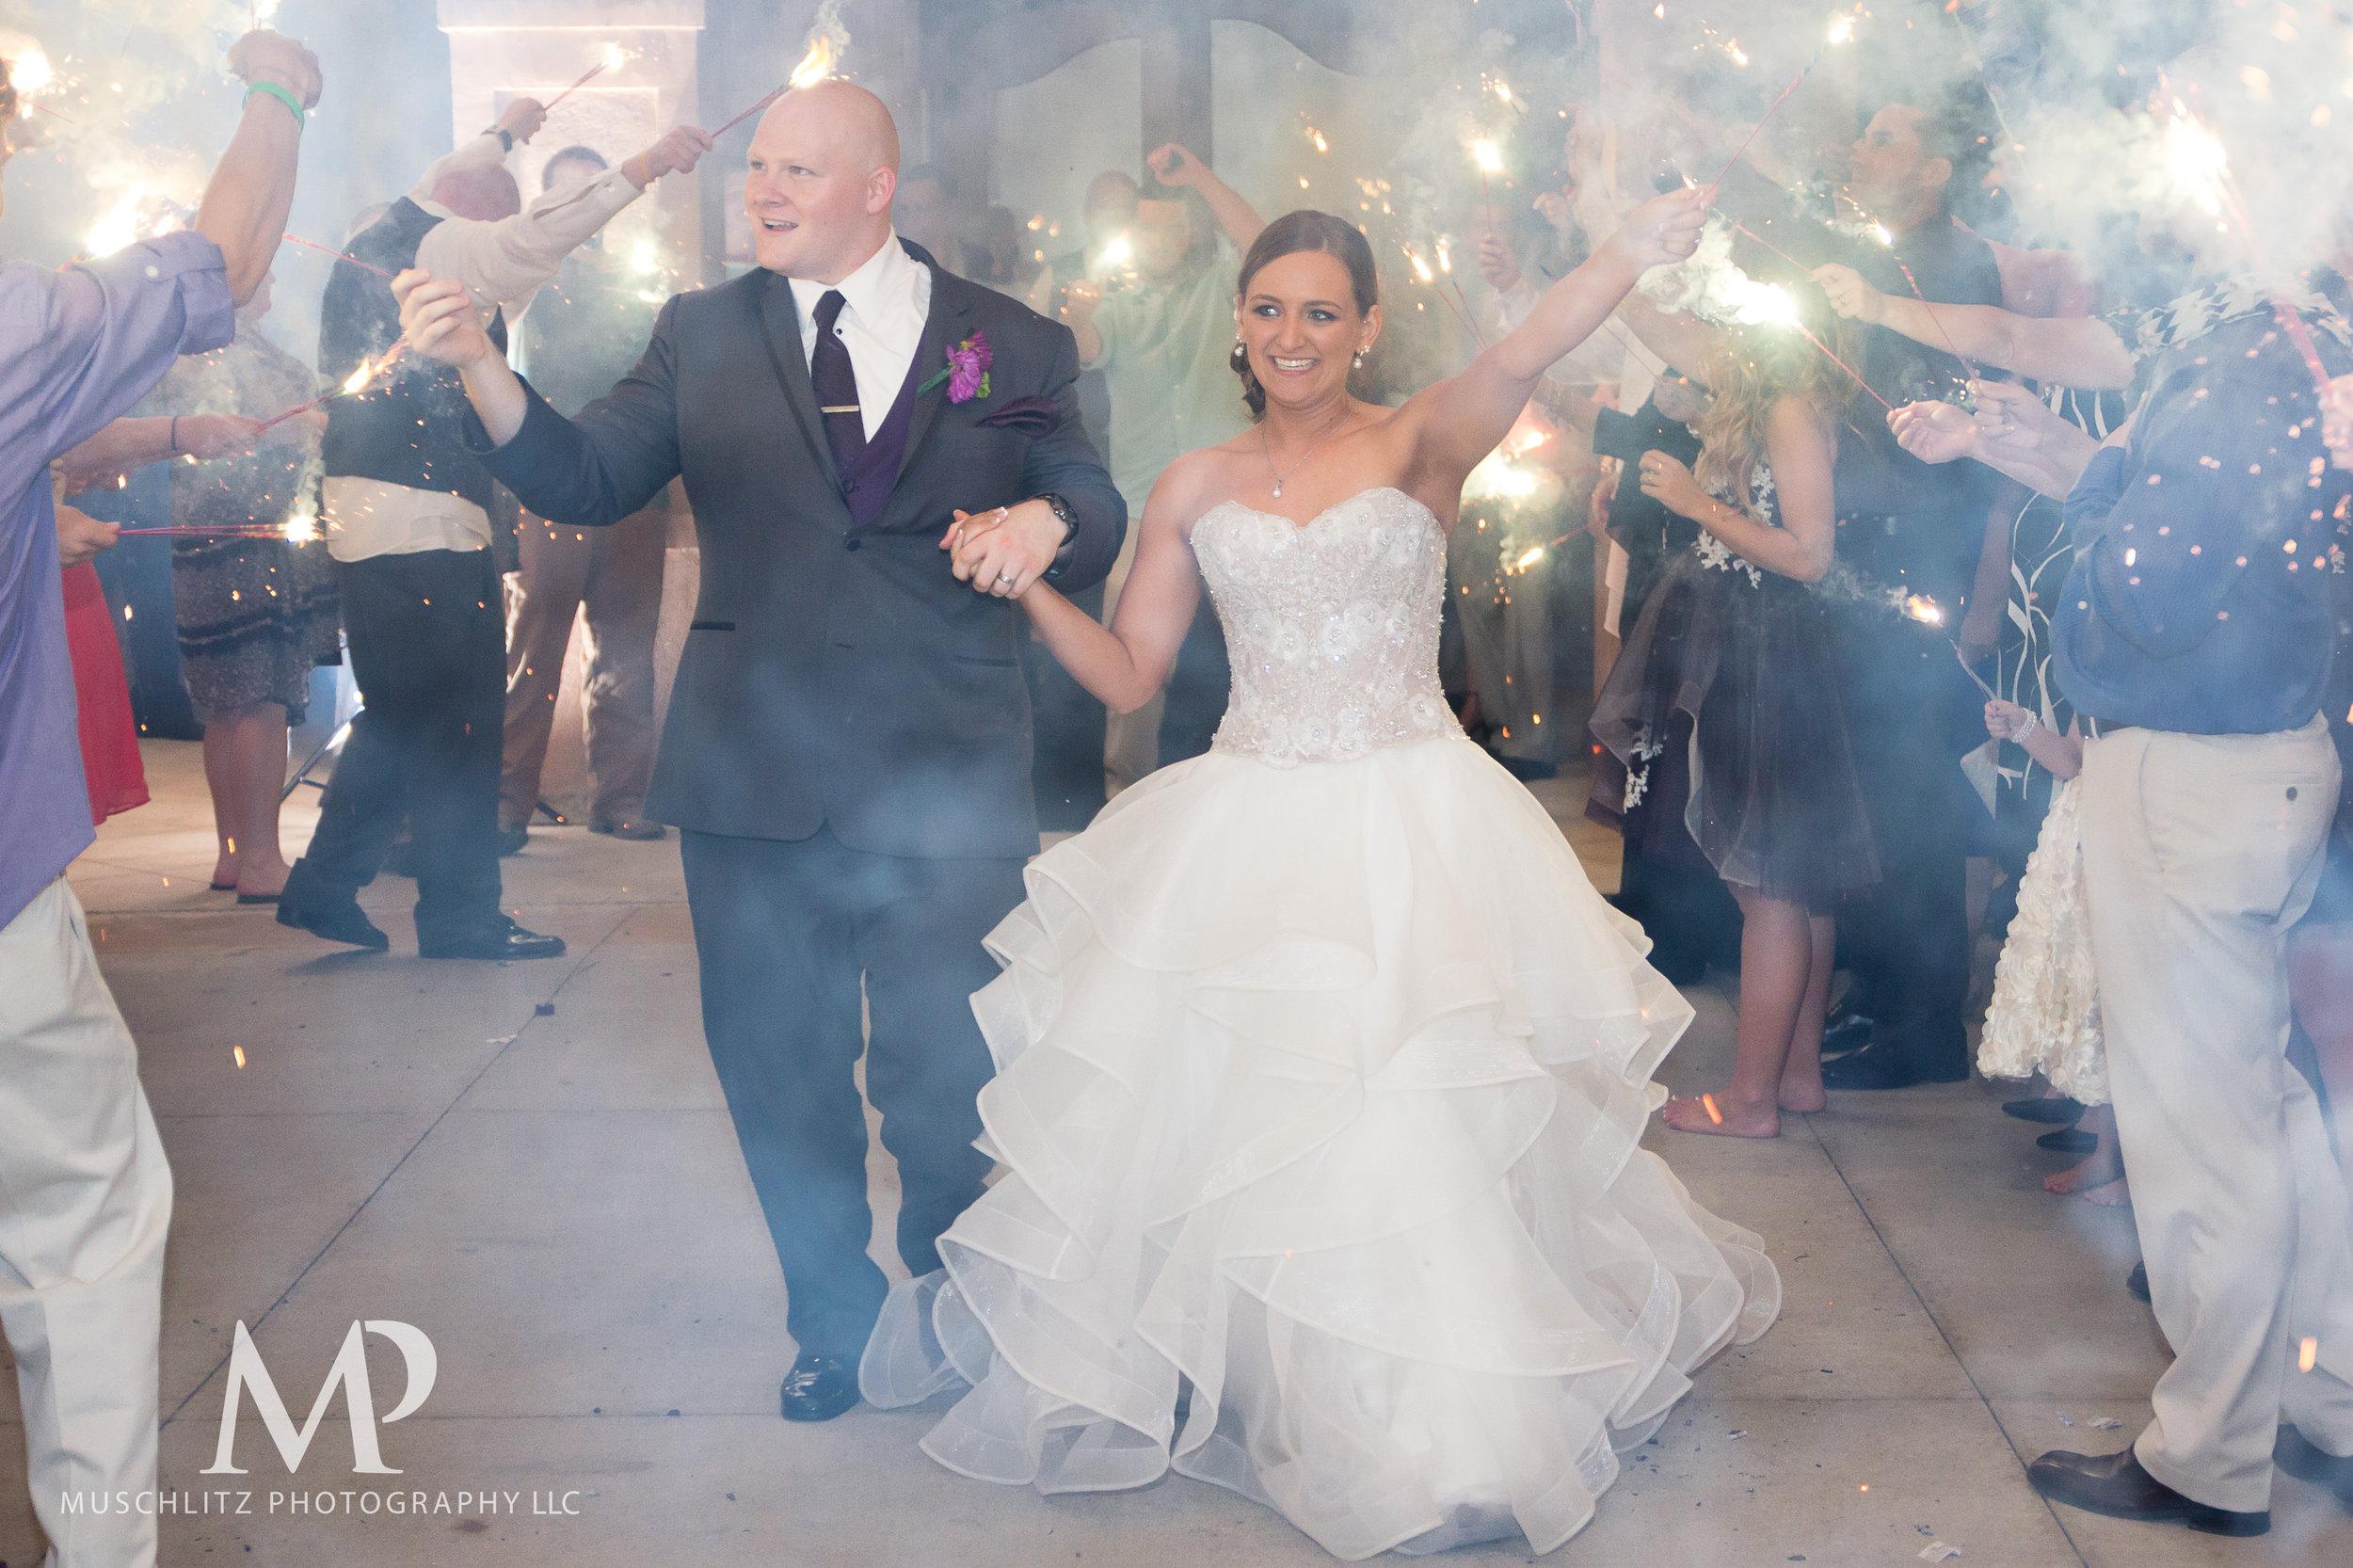 club-at-corazon-wedding-ceremony-reception-columbus-dublin-ohio-ohio-university-theme-090.JPG